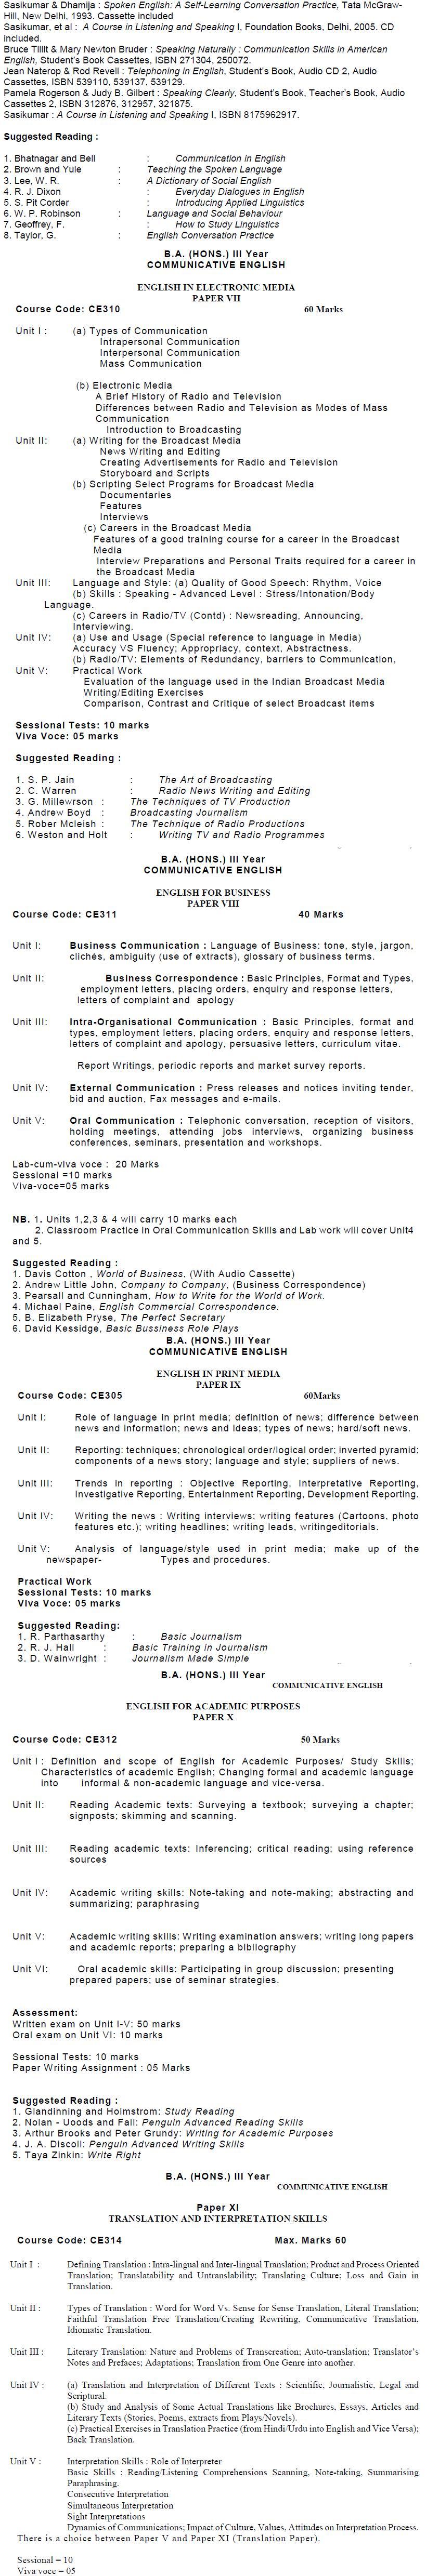 AMU Syllabus - Arts - M. A. English/M. A. ELT